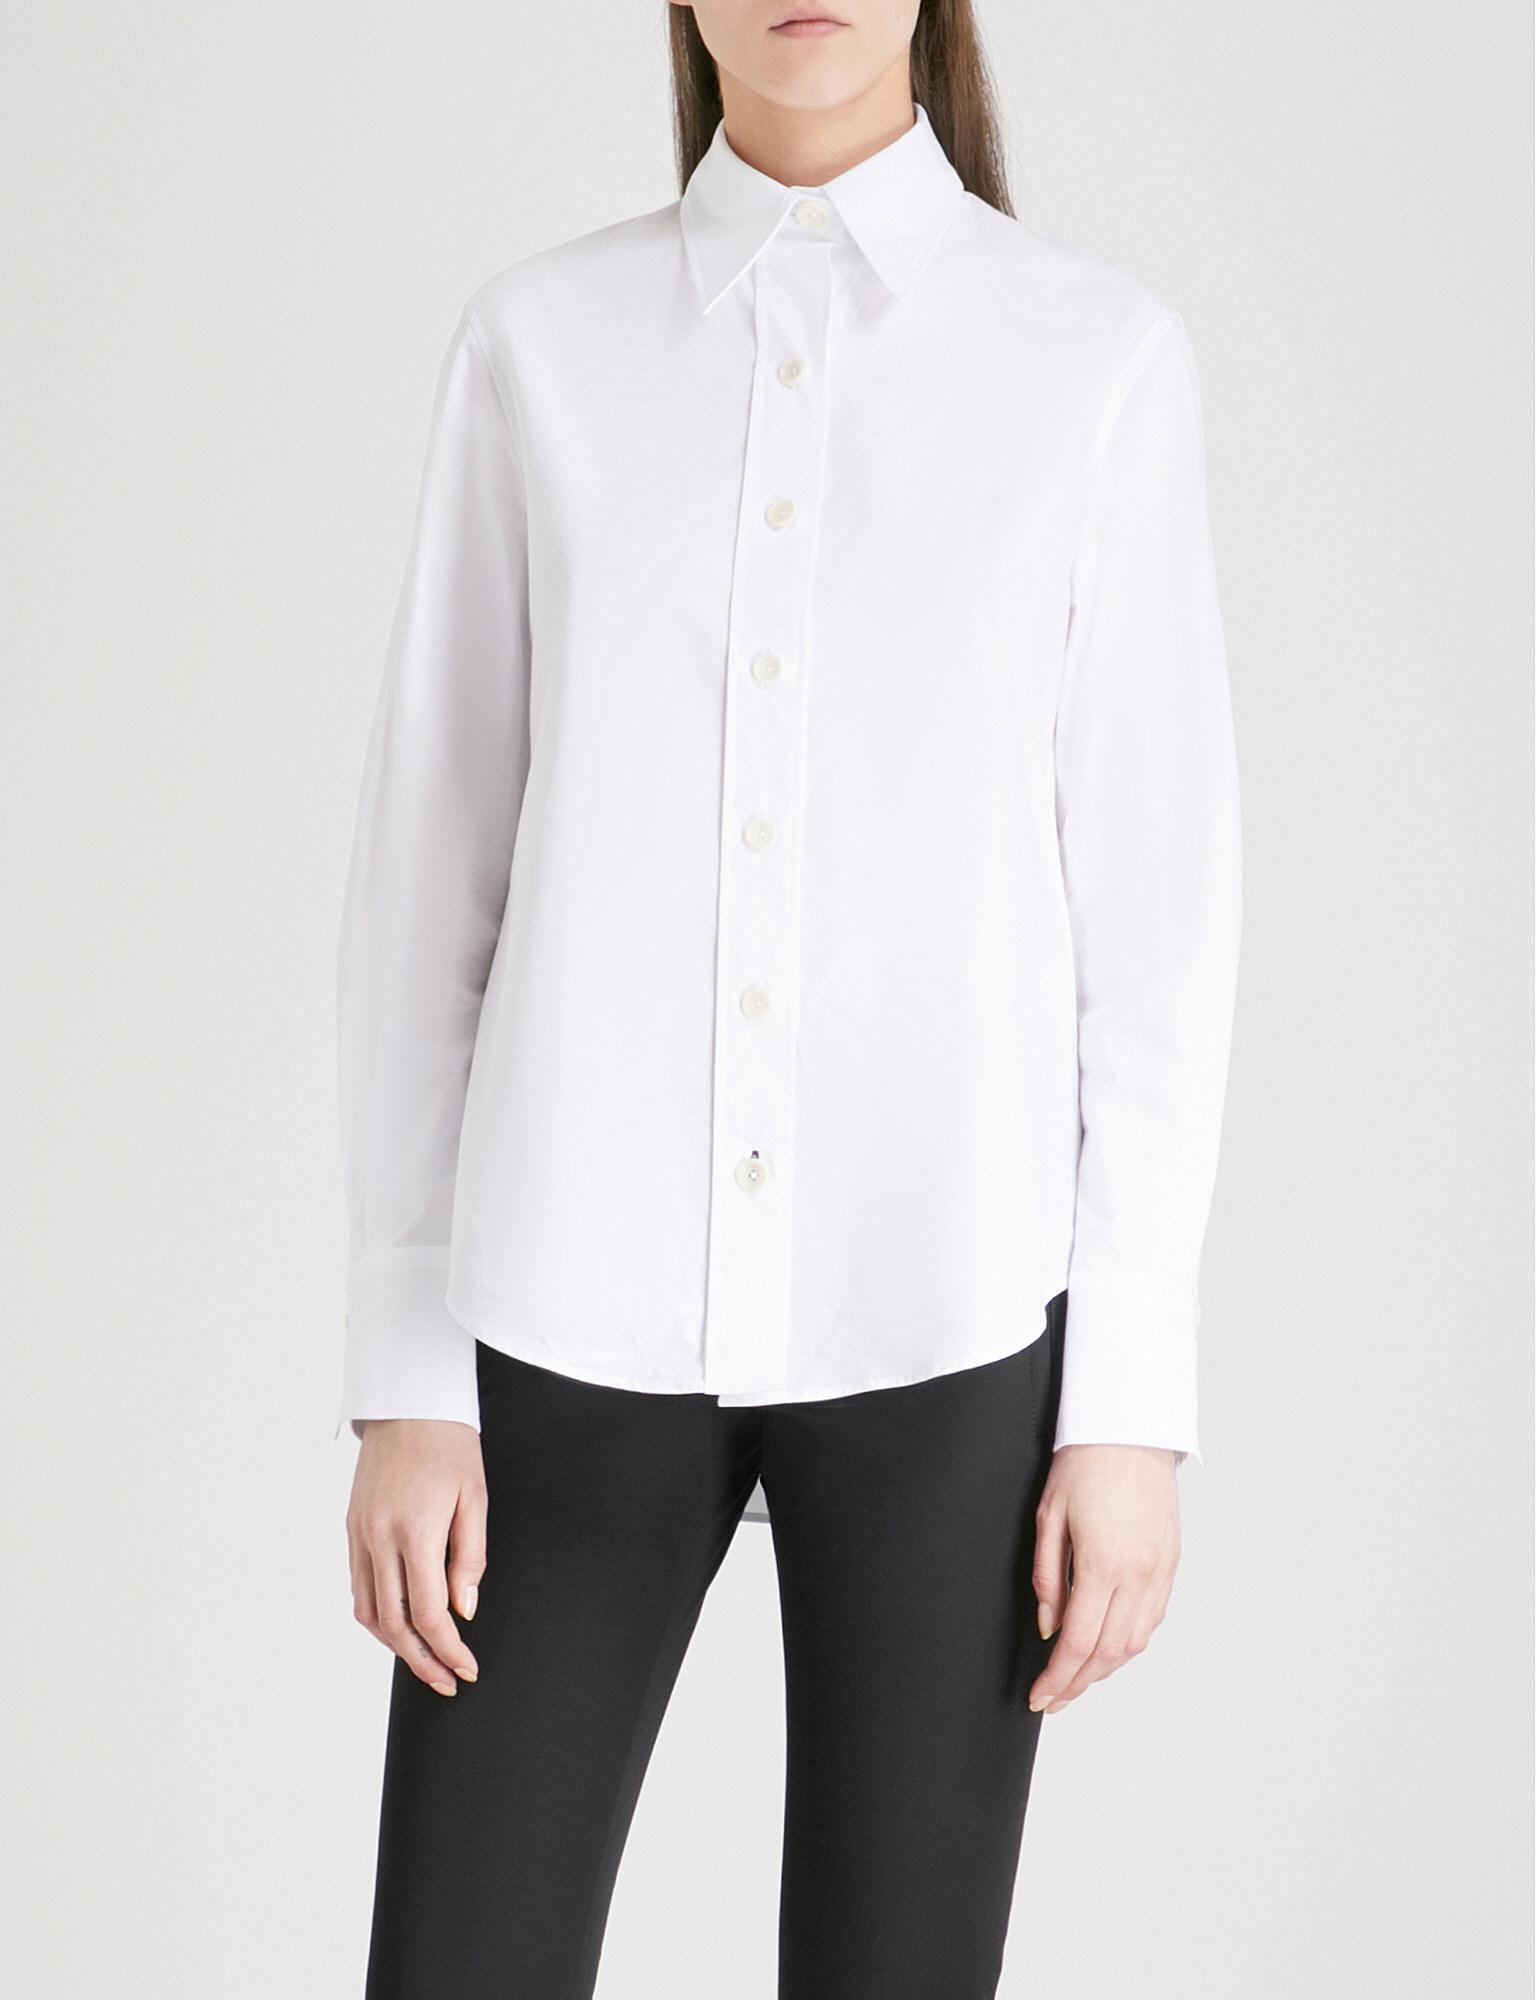 9a5b15215e7 Lyst - JOSEPH Garcon Cotton Shirt in White